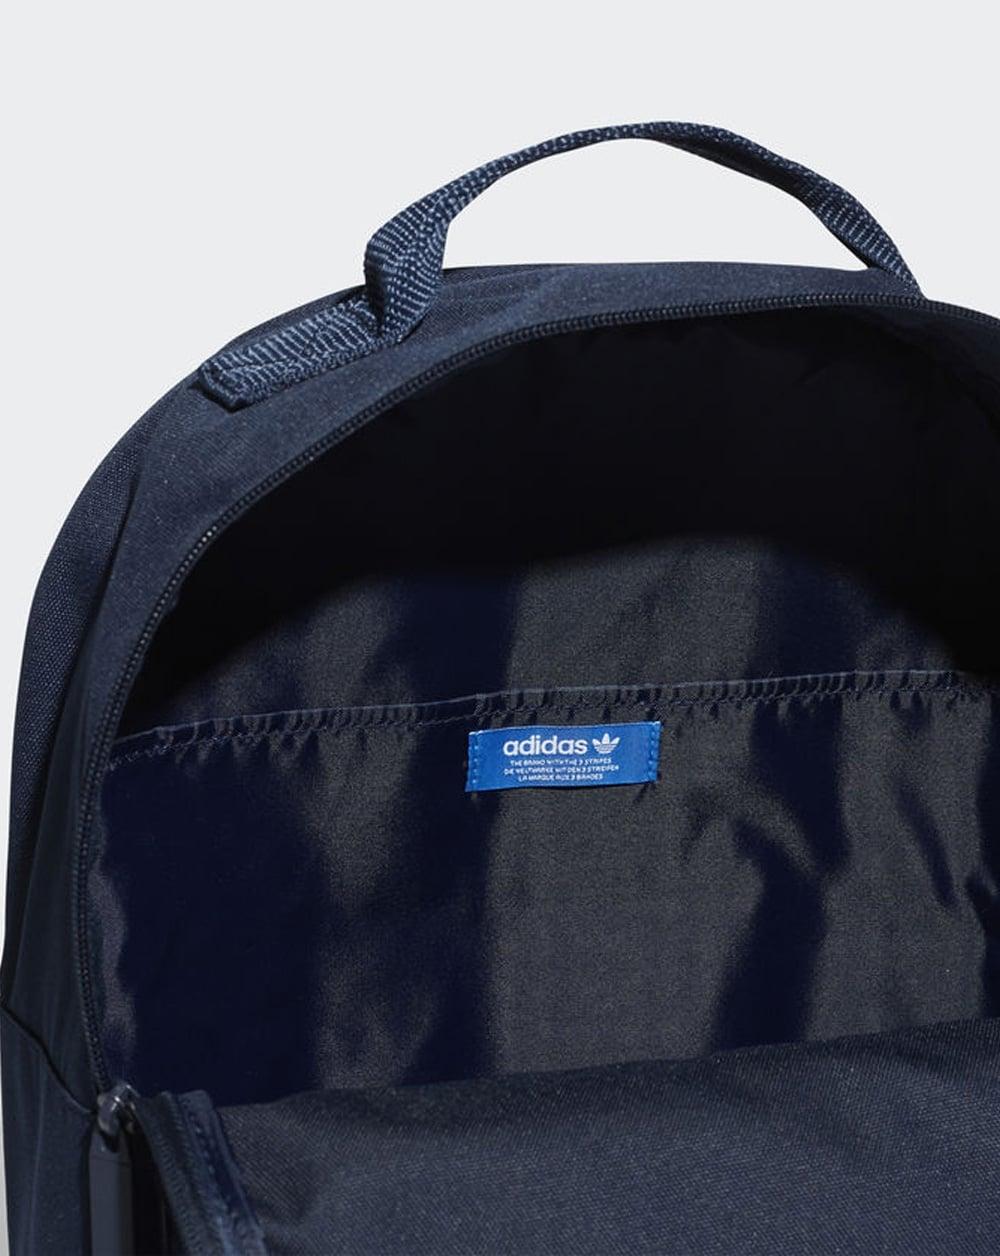 buy online 18137 324f2 Adidas Originals Classic Trefoil Backpack Navy